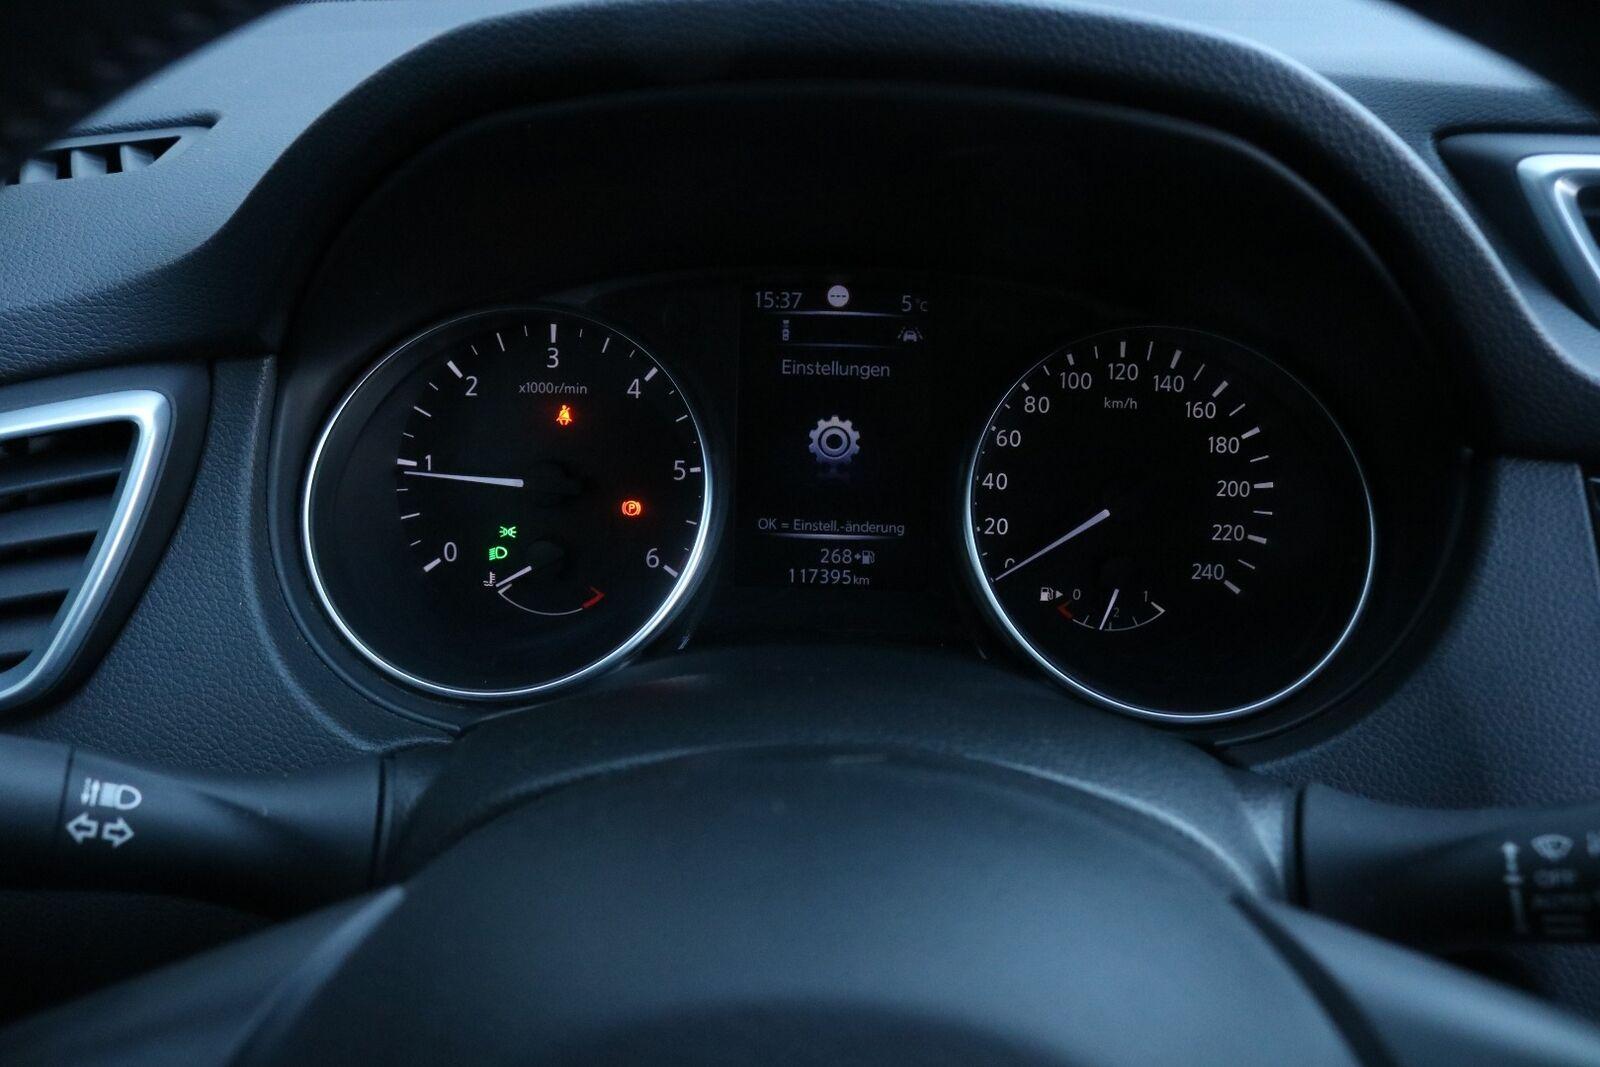 Nissan Qashqai dCi 130 Acenta